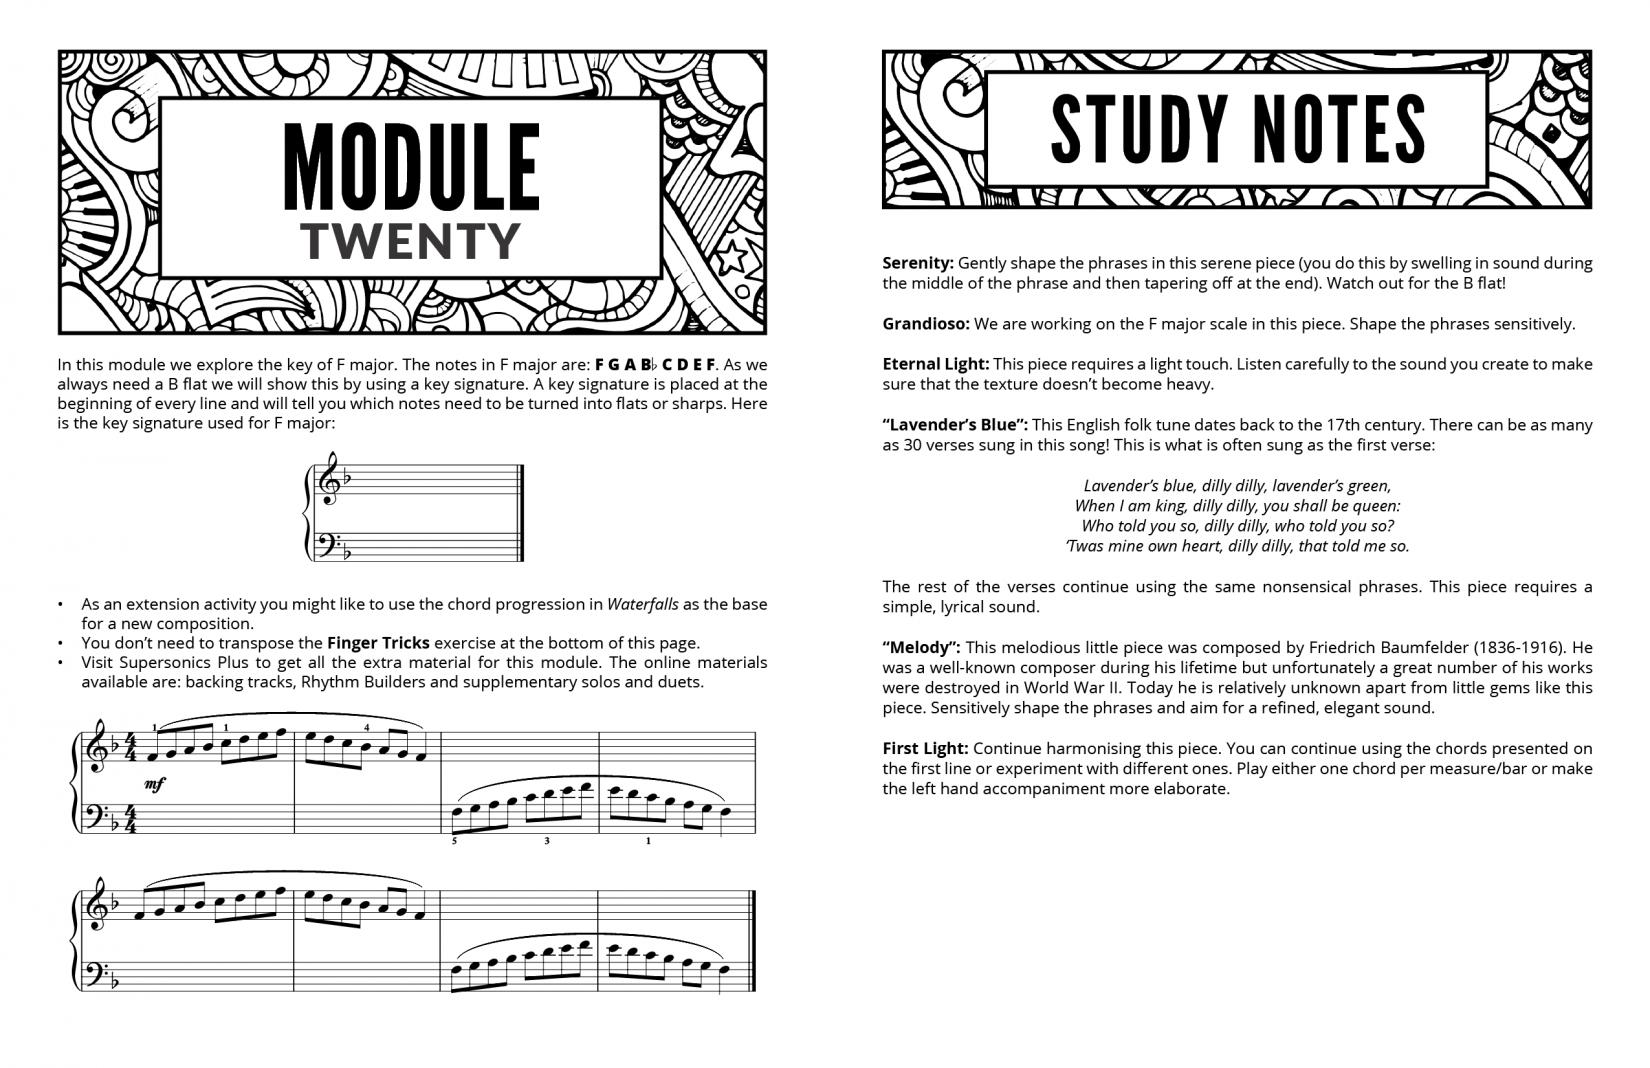 Supersonics Piano Method Module 20 sample